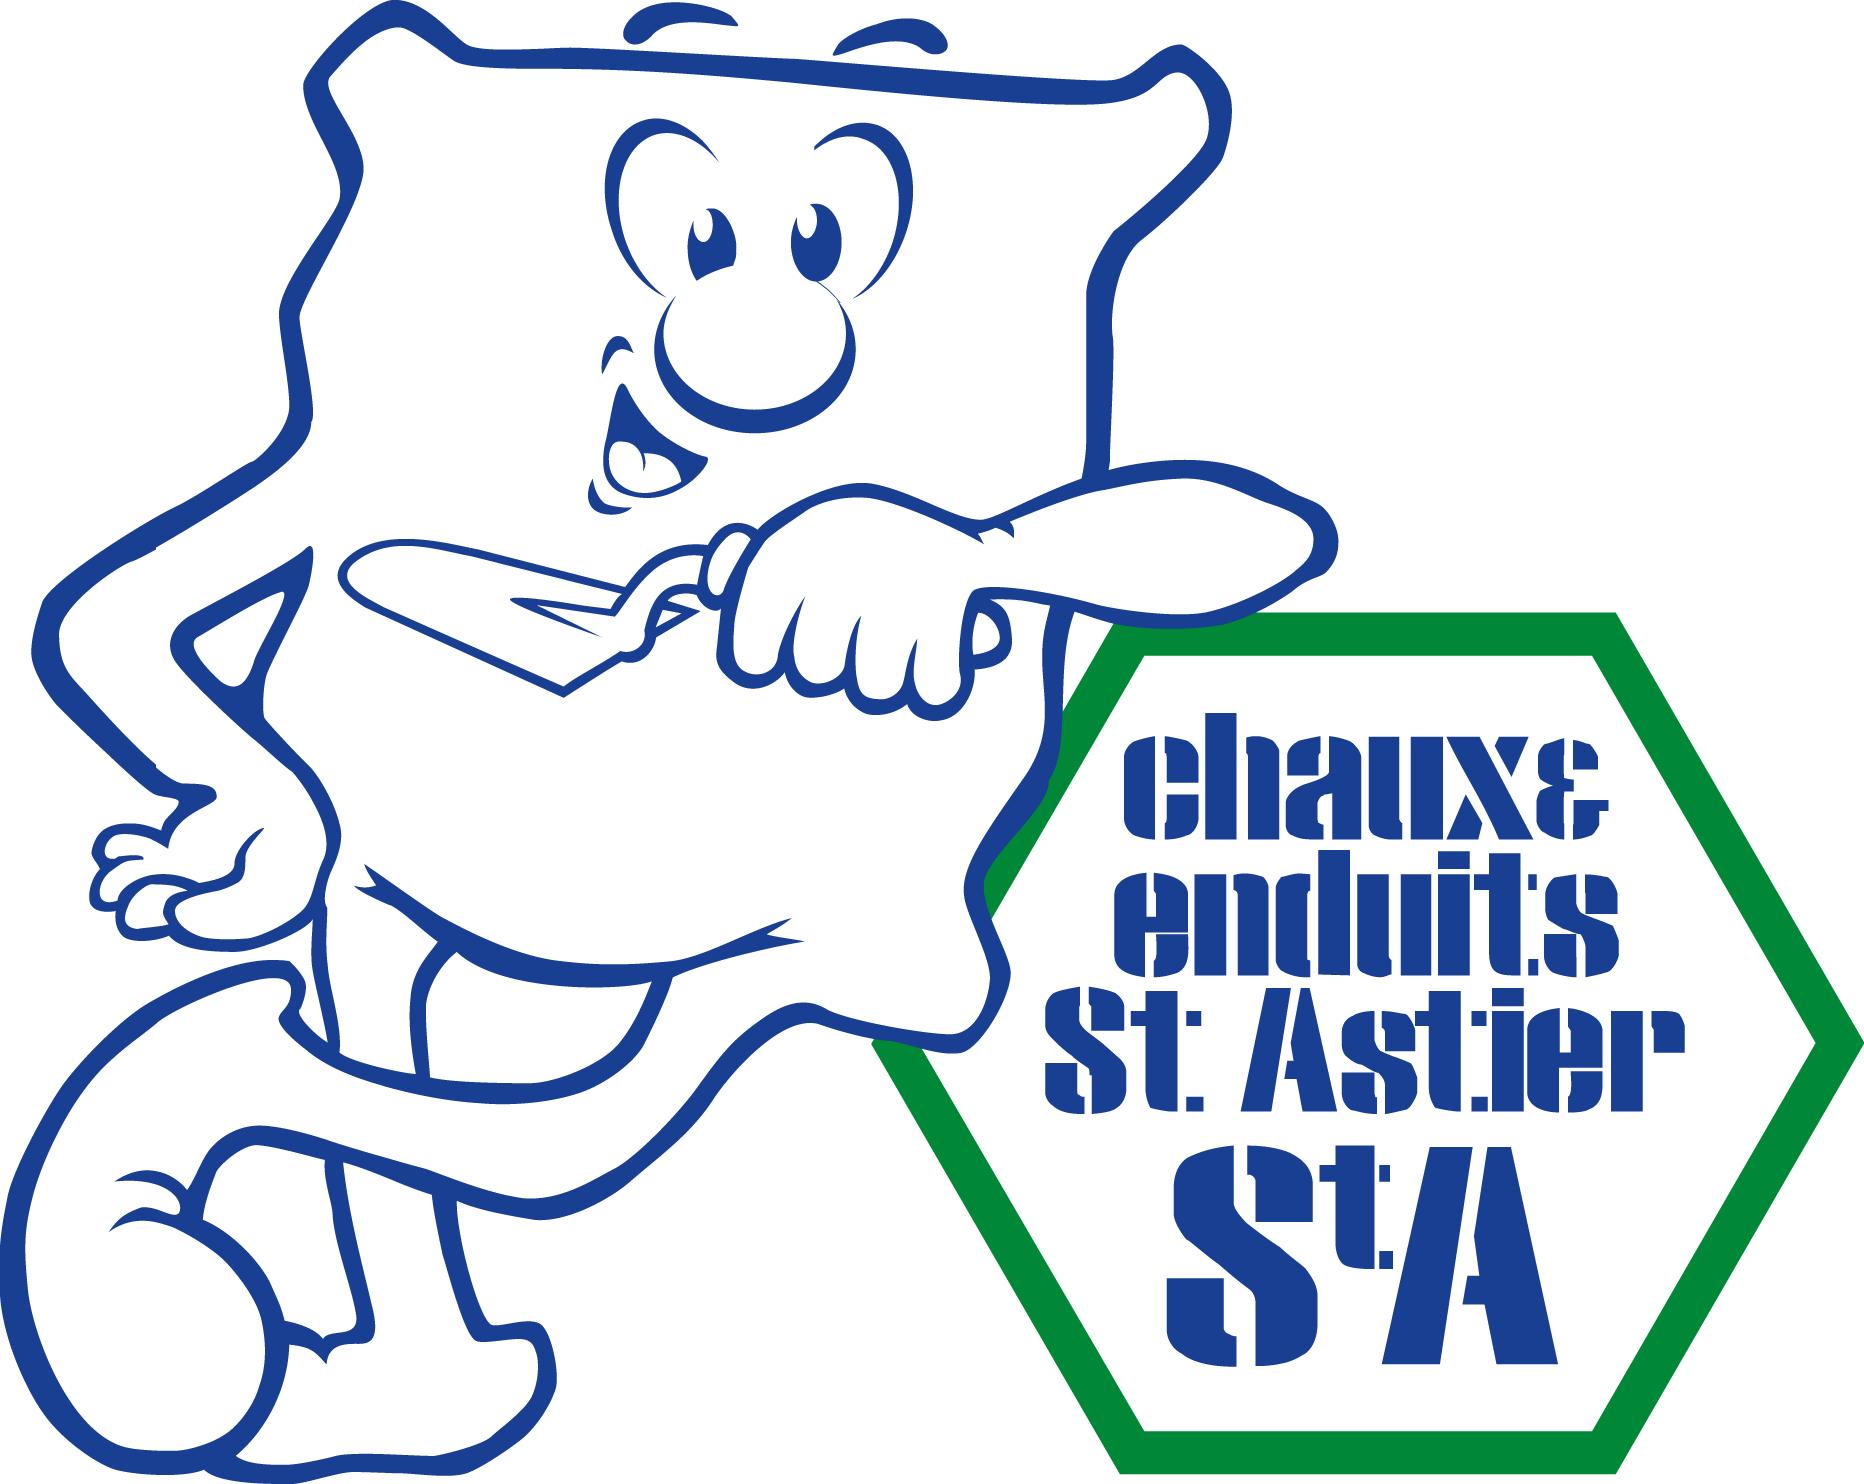 St. Astier